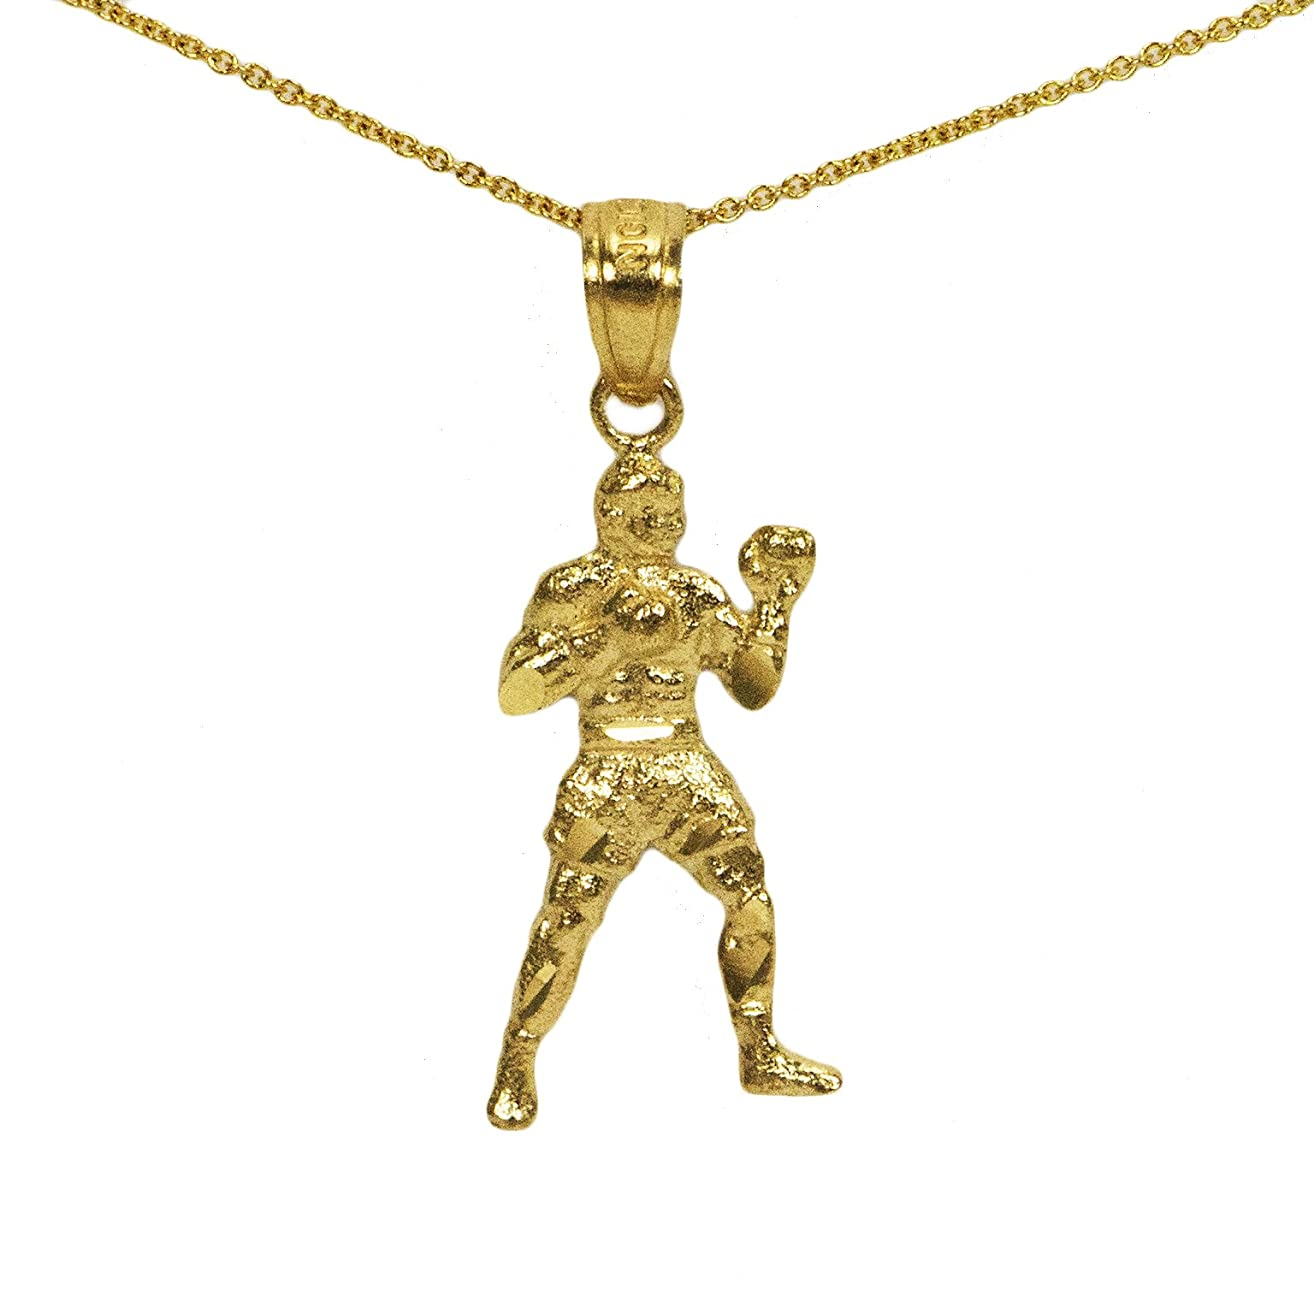 10k Yellow Gold Boxing Pendant